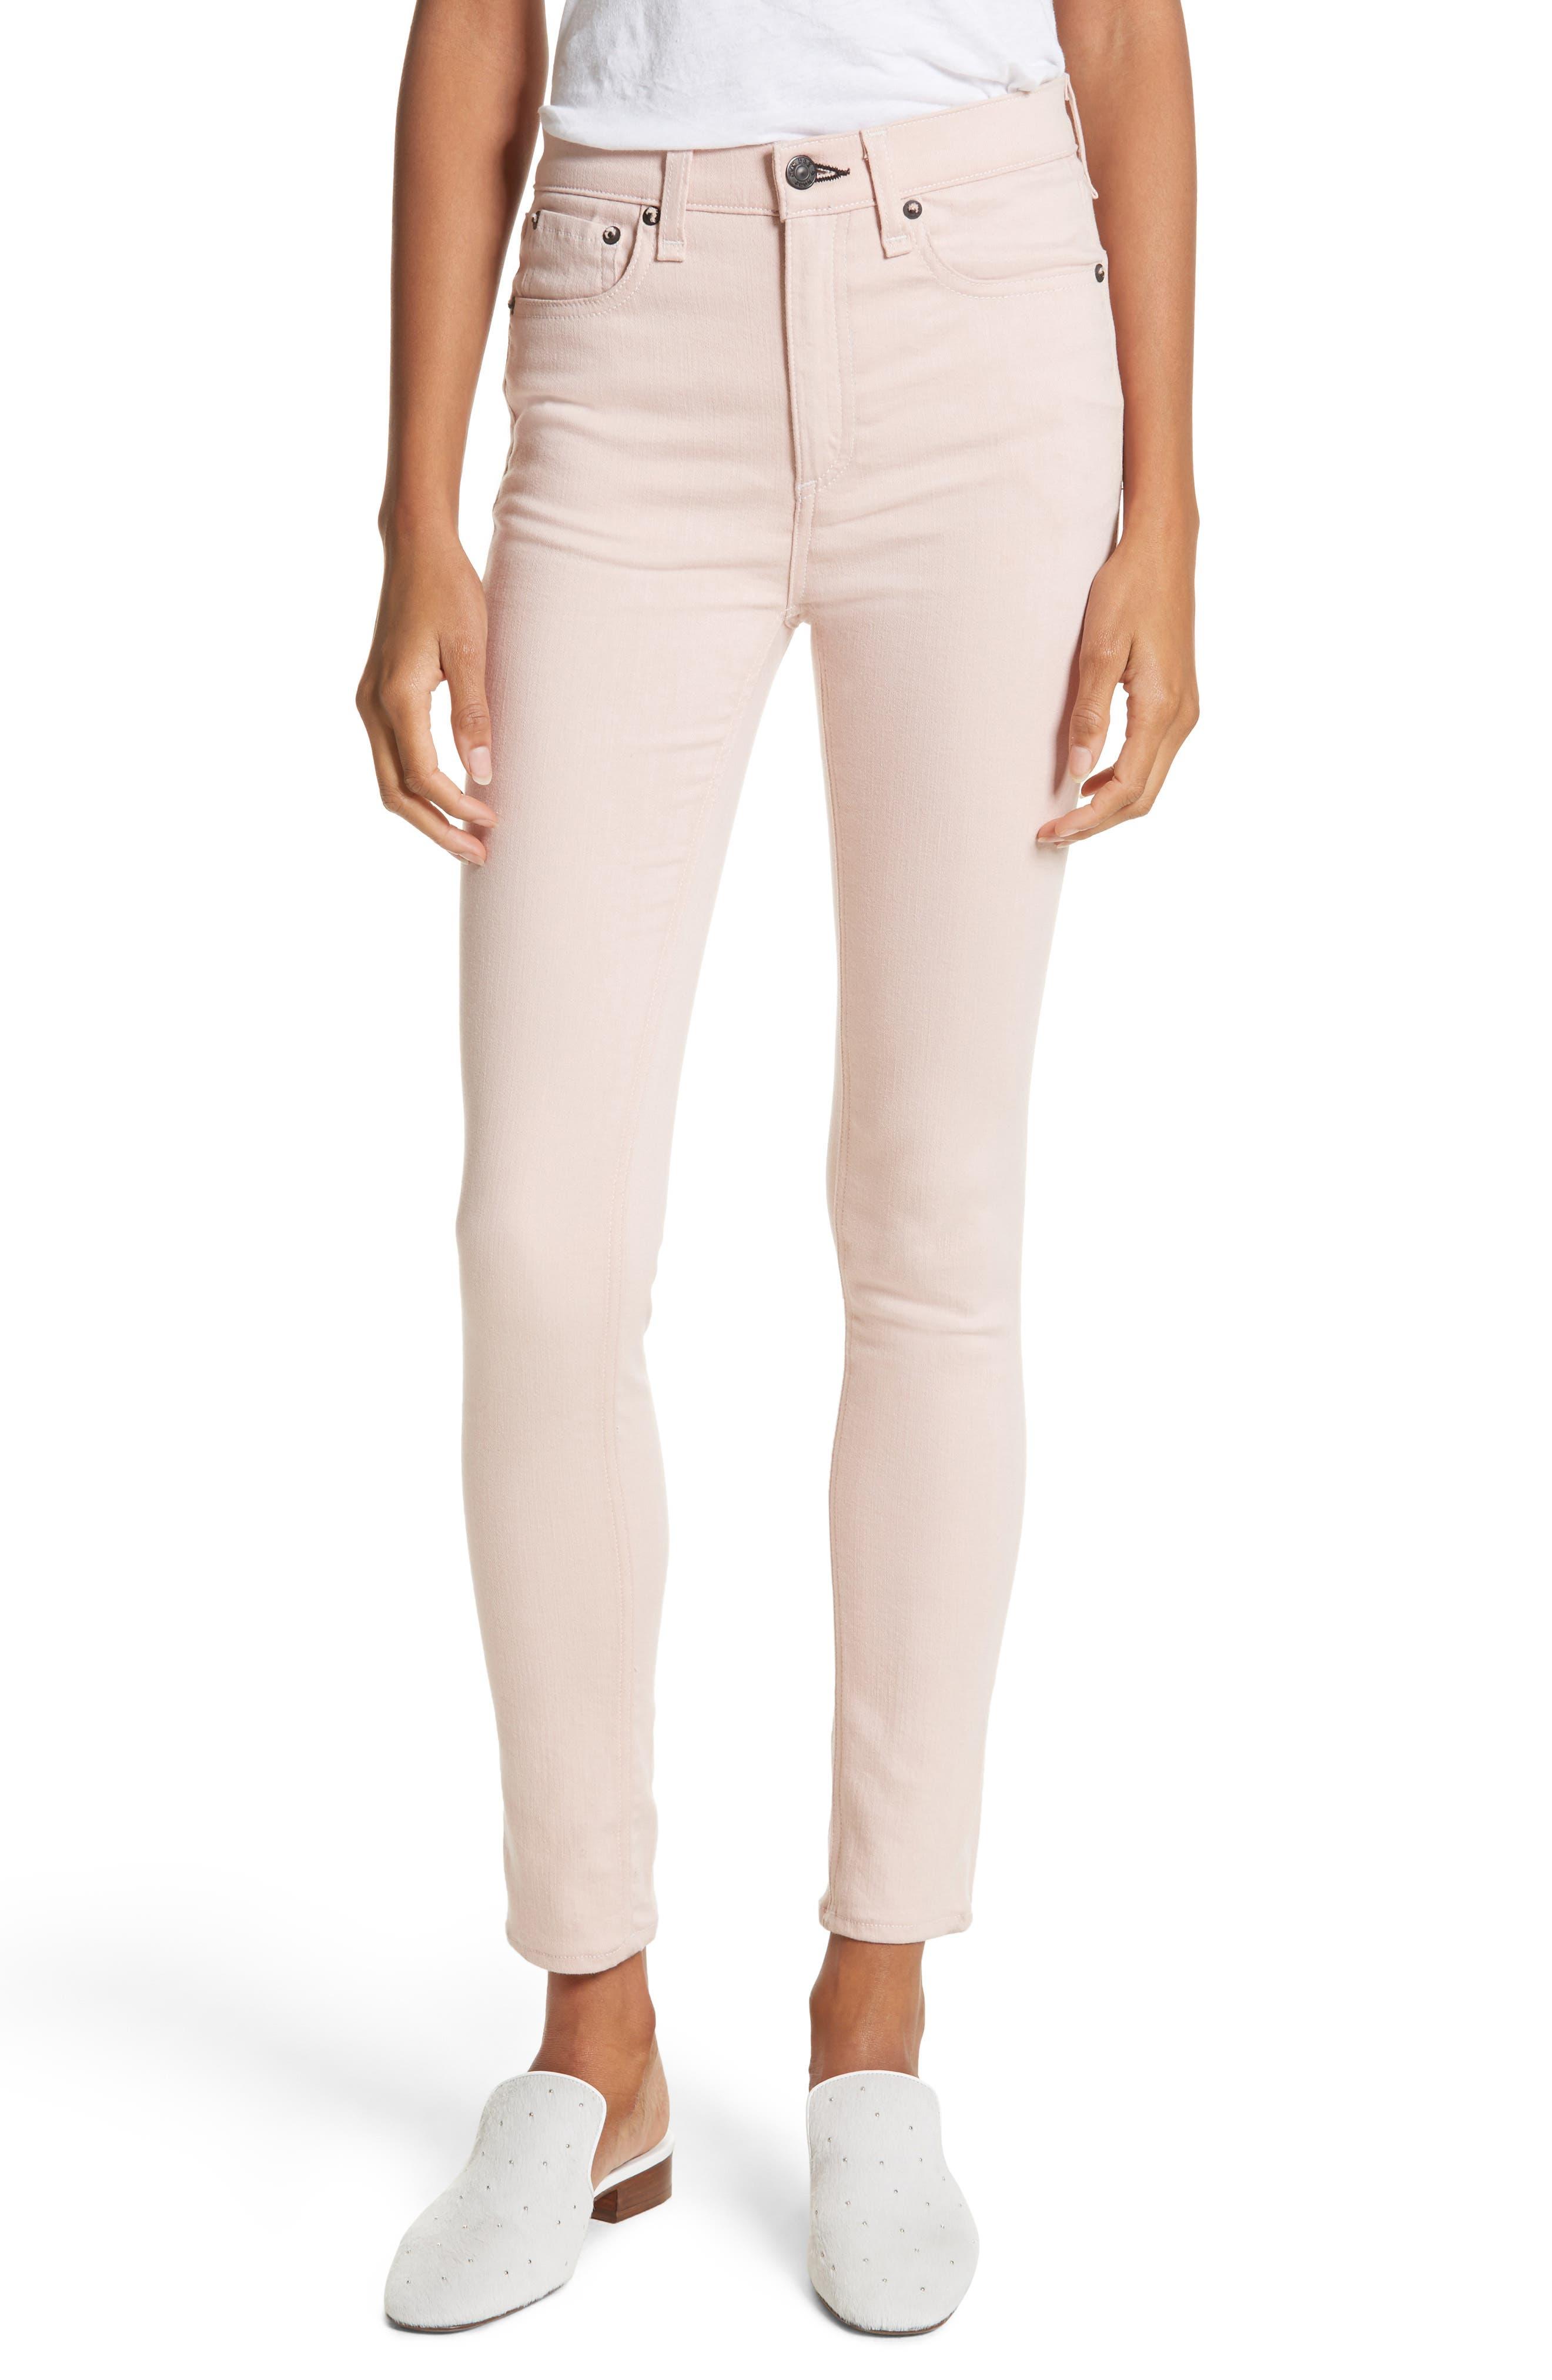 Main Image - rag & bone/JEAN High Waist Ankle Skinny Jeans (Blush Twill)